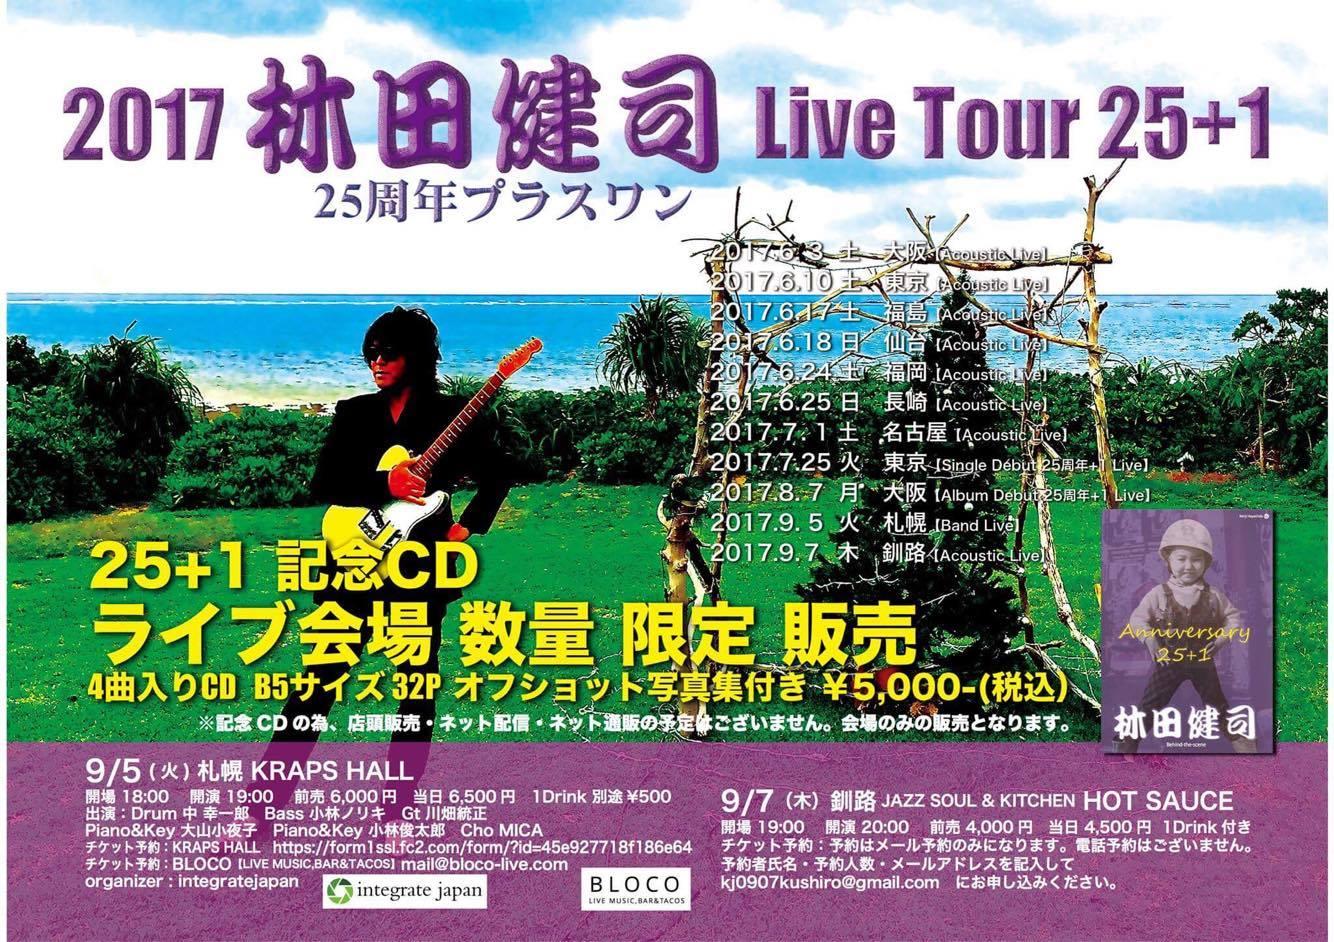 [2017.9.5 TUE] 2017 林田健司 Live Tour 25+1「25周年プラスワン」